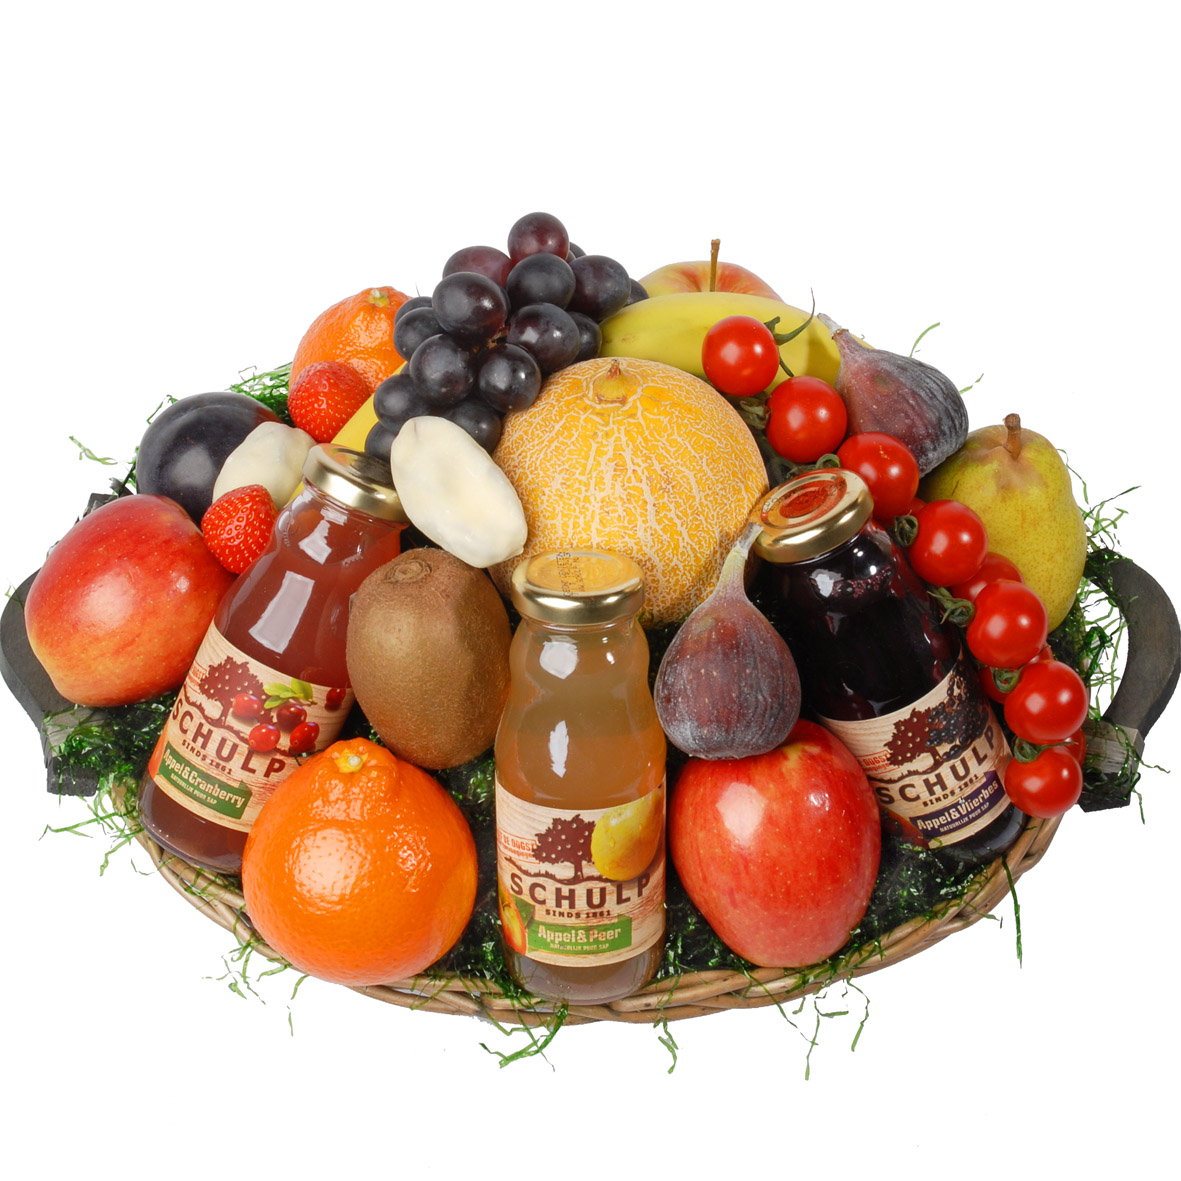 Fruitmand beterschap